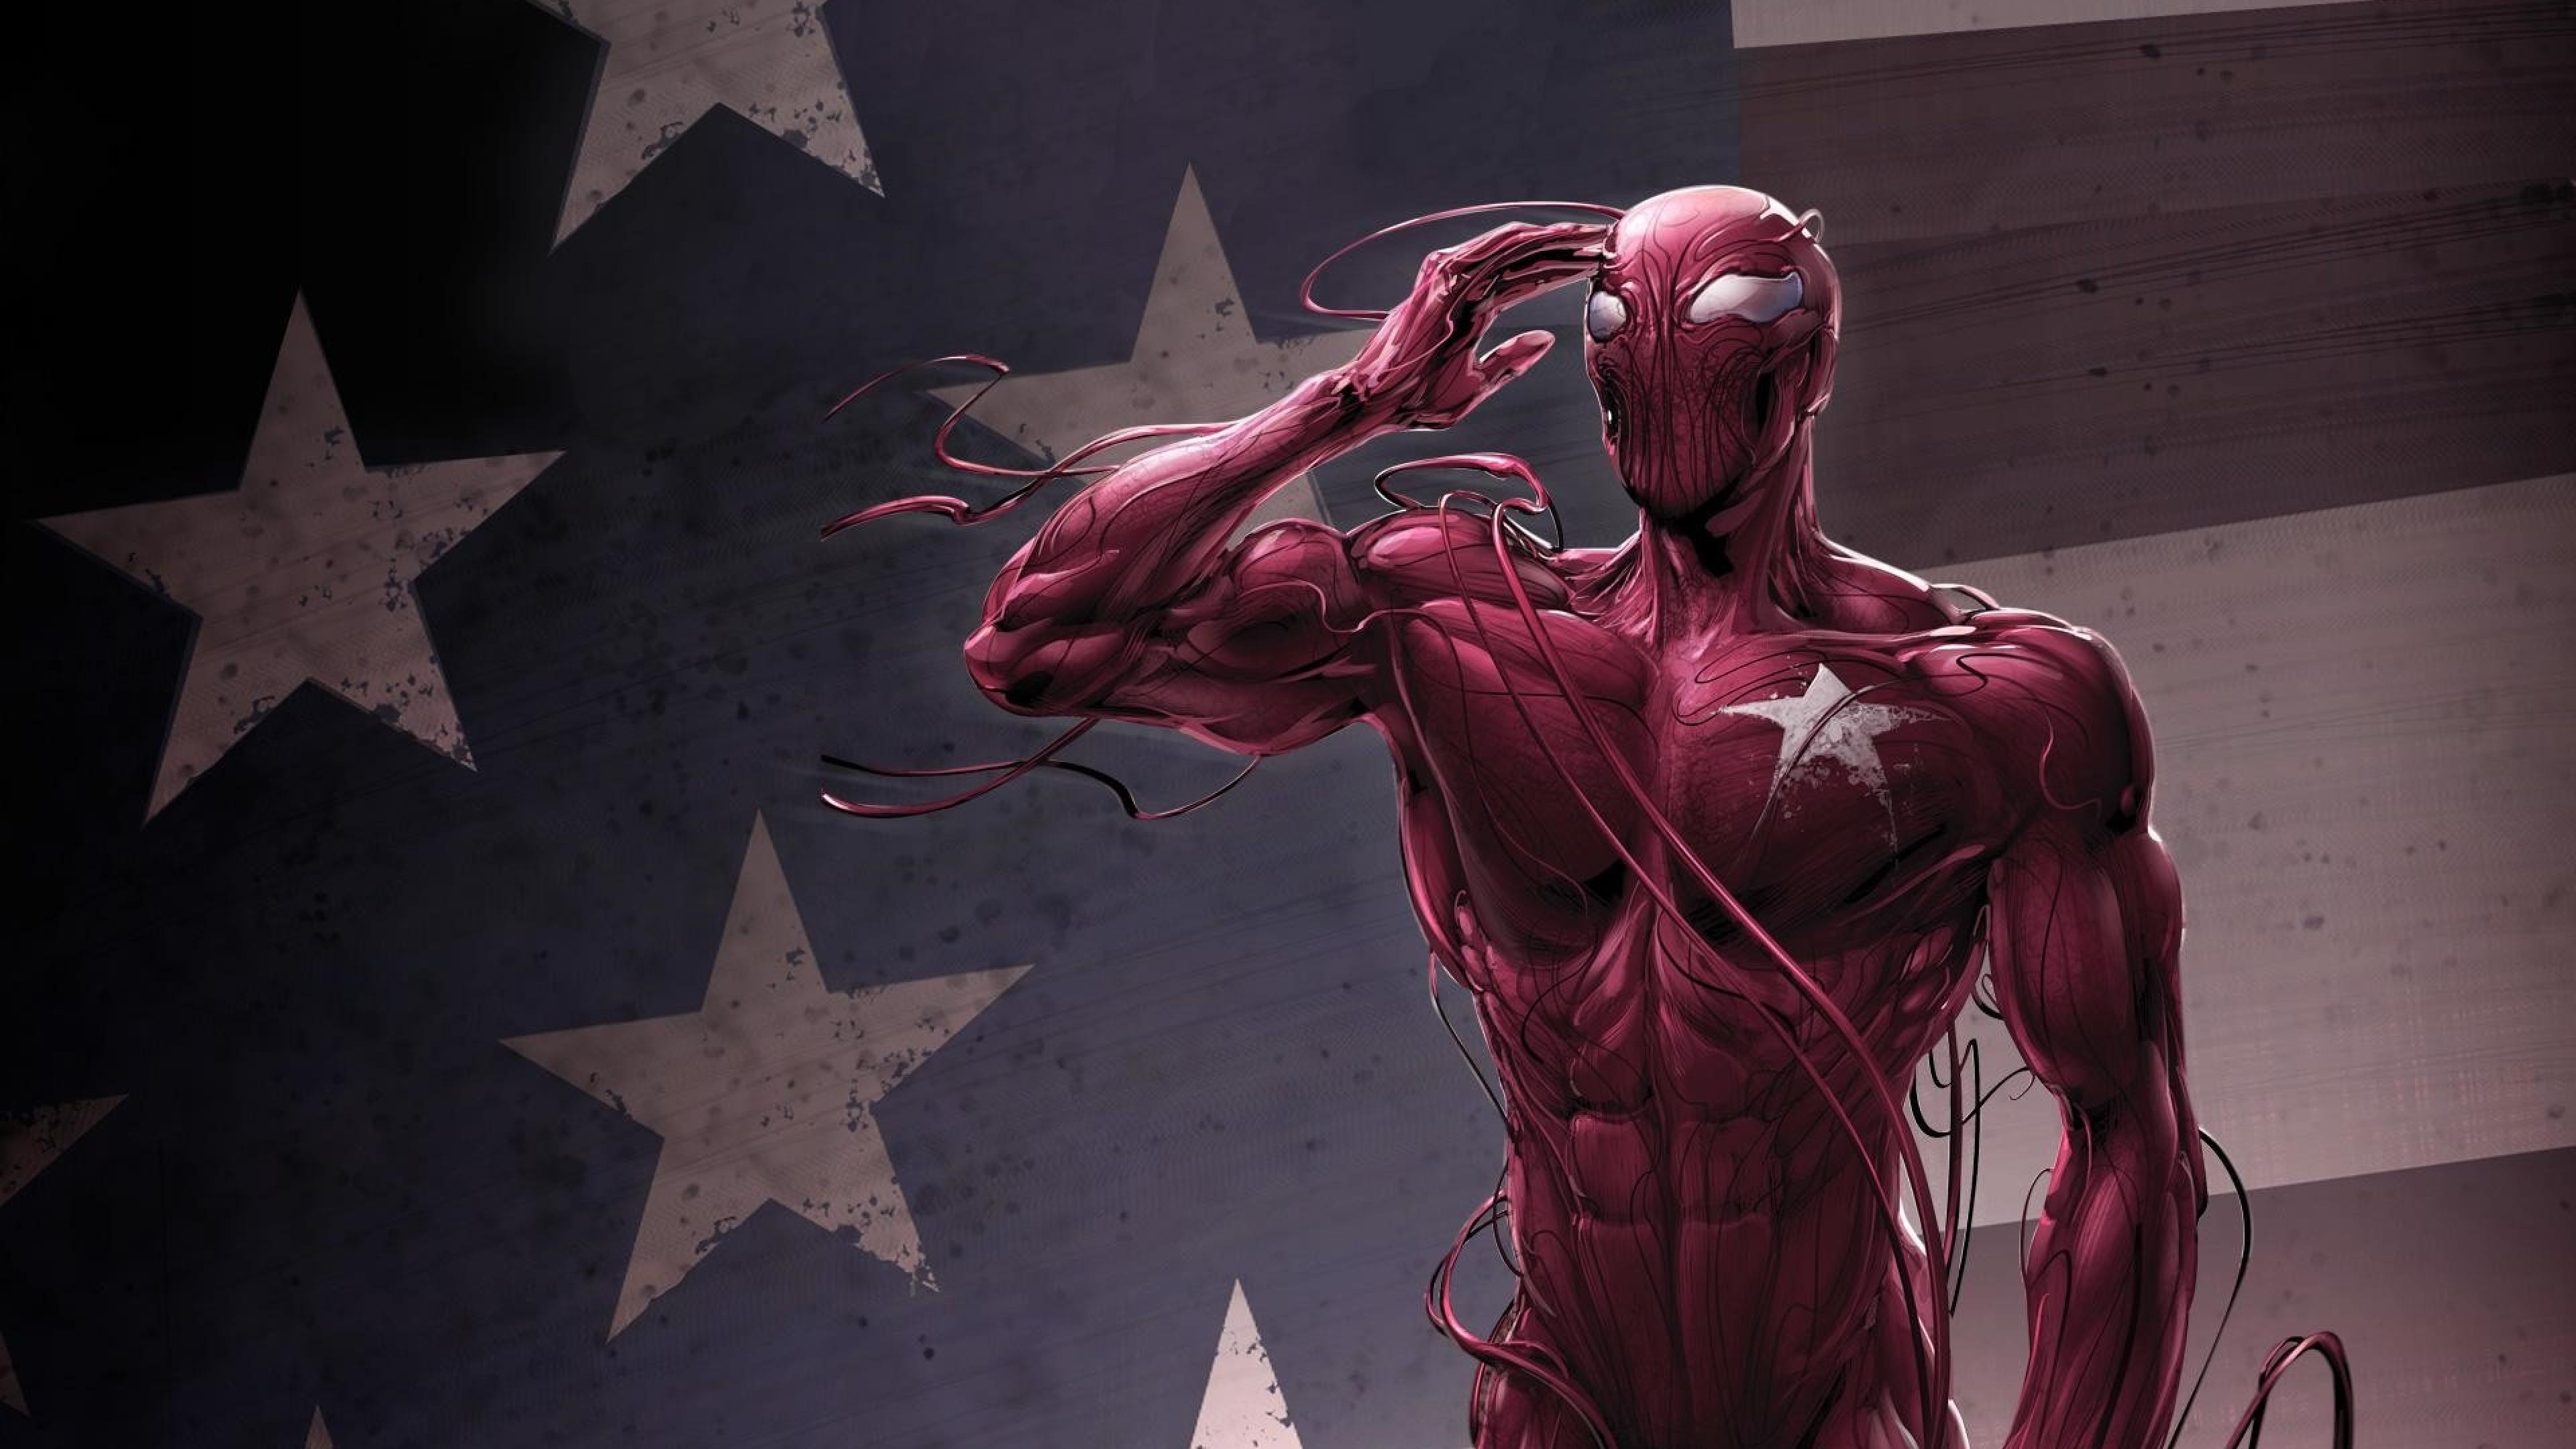 3840x2160 Marvel Comics Carnage 4k Wallpaper Hd Superheroes